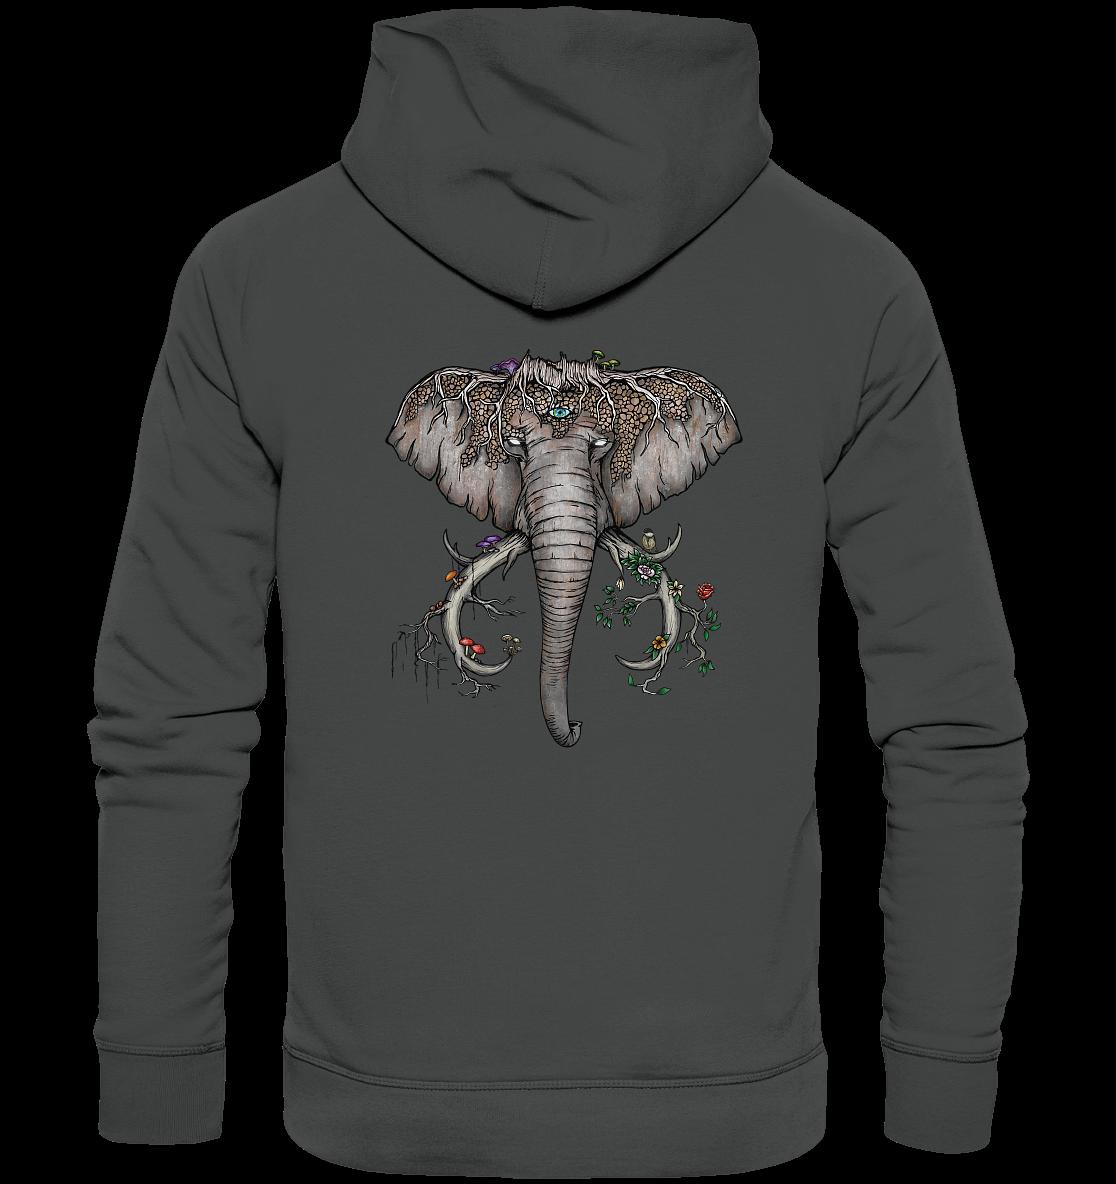 back-organic-fashion-hoodie-444545-1116x-1.png